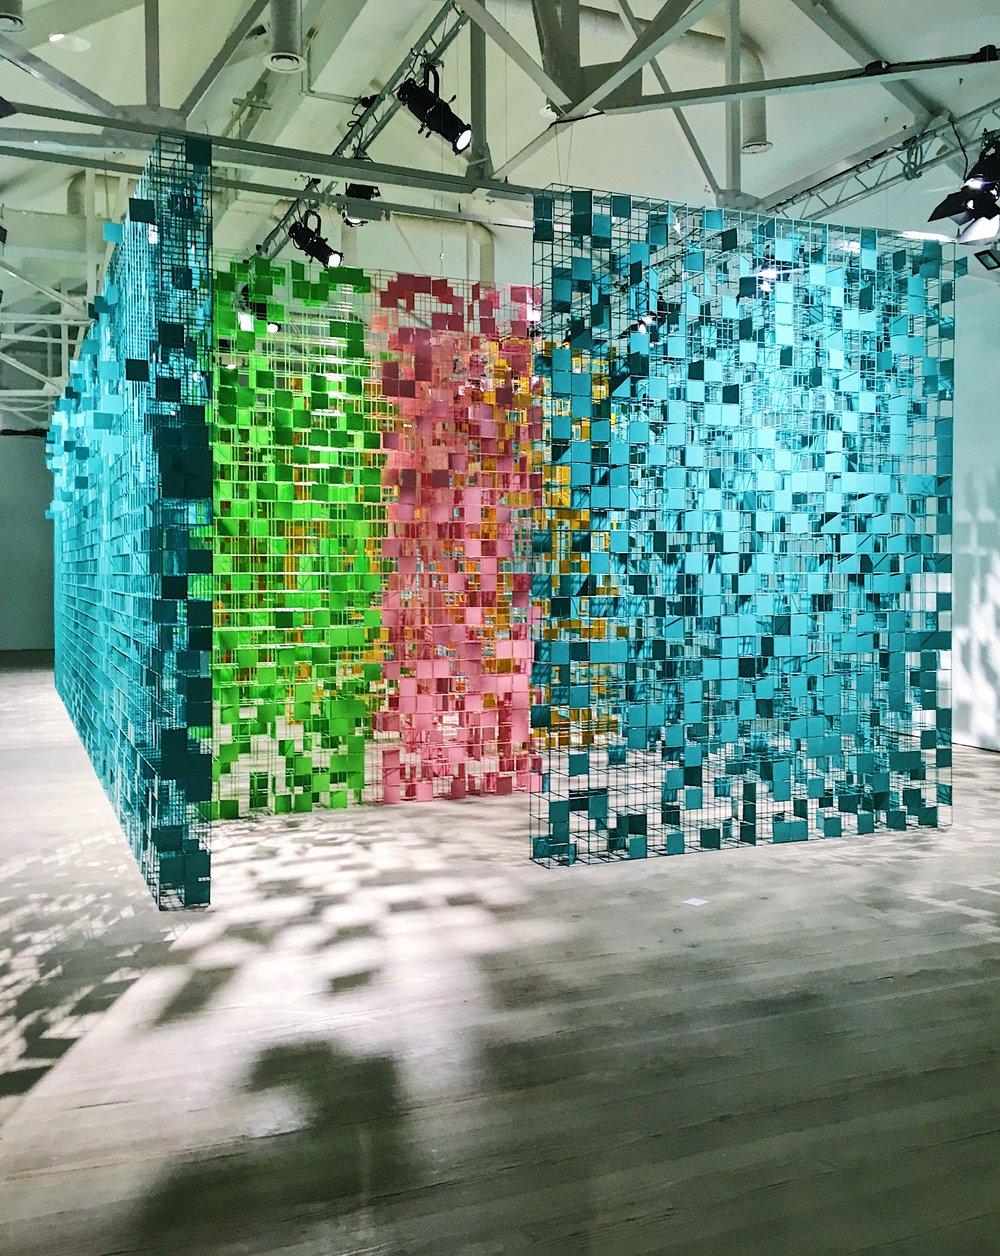 Rashid Khalifa Saatchi Gallery London Eileen Hsieh followthatbug follow that bug modern art maze labyrinth.jpg